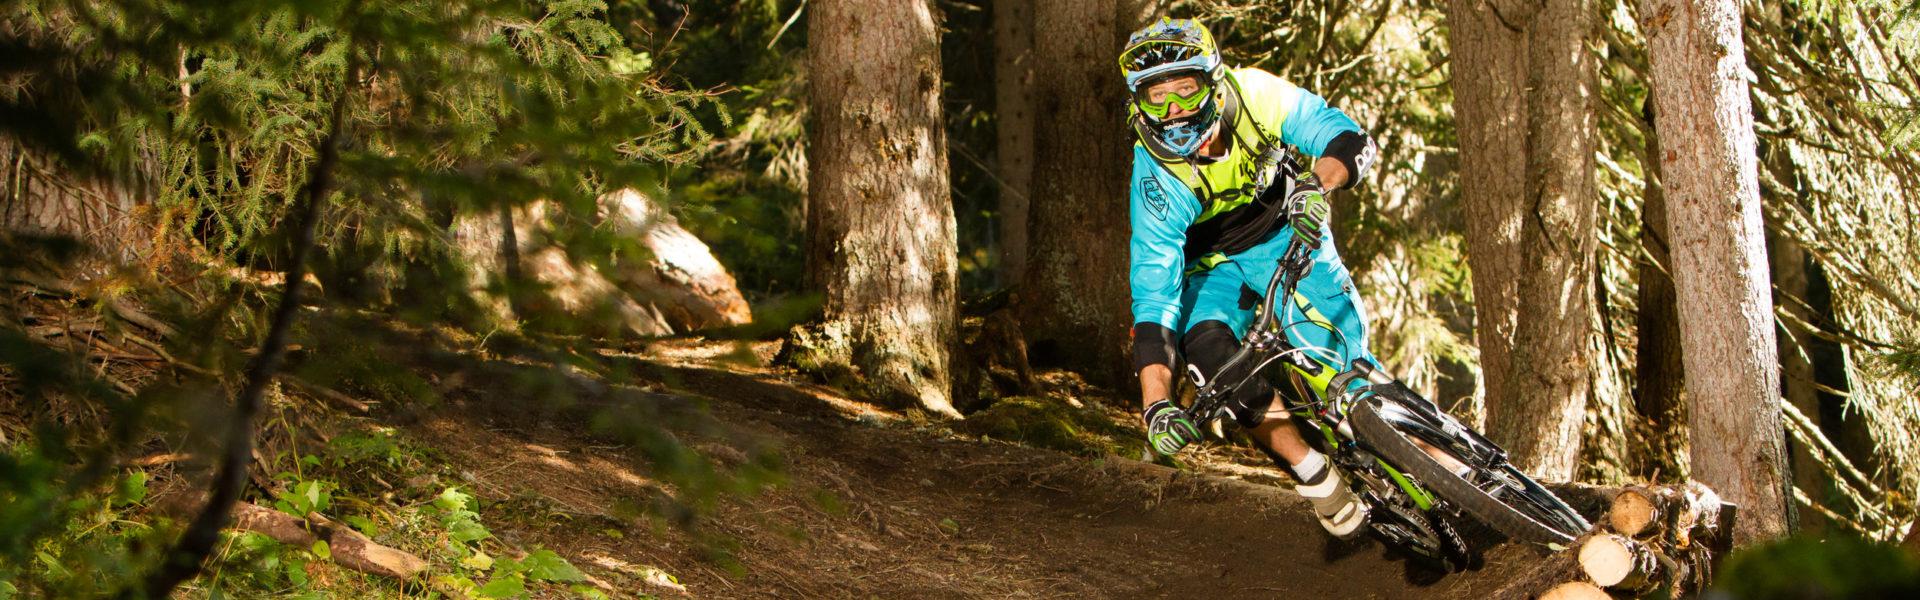 Bike-Trail Lech 13 -® Skilifte Lech, Michael Marte© Dietmar Mathis null